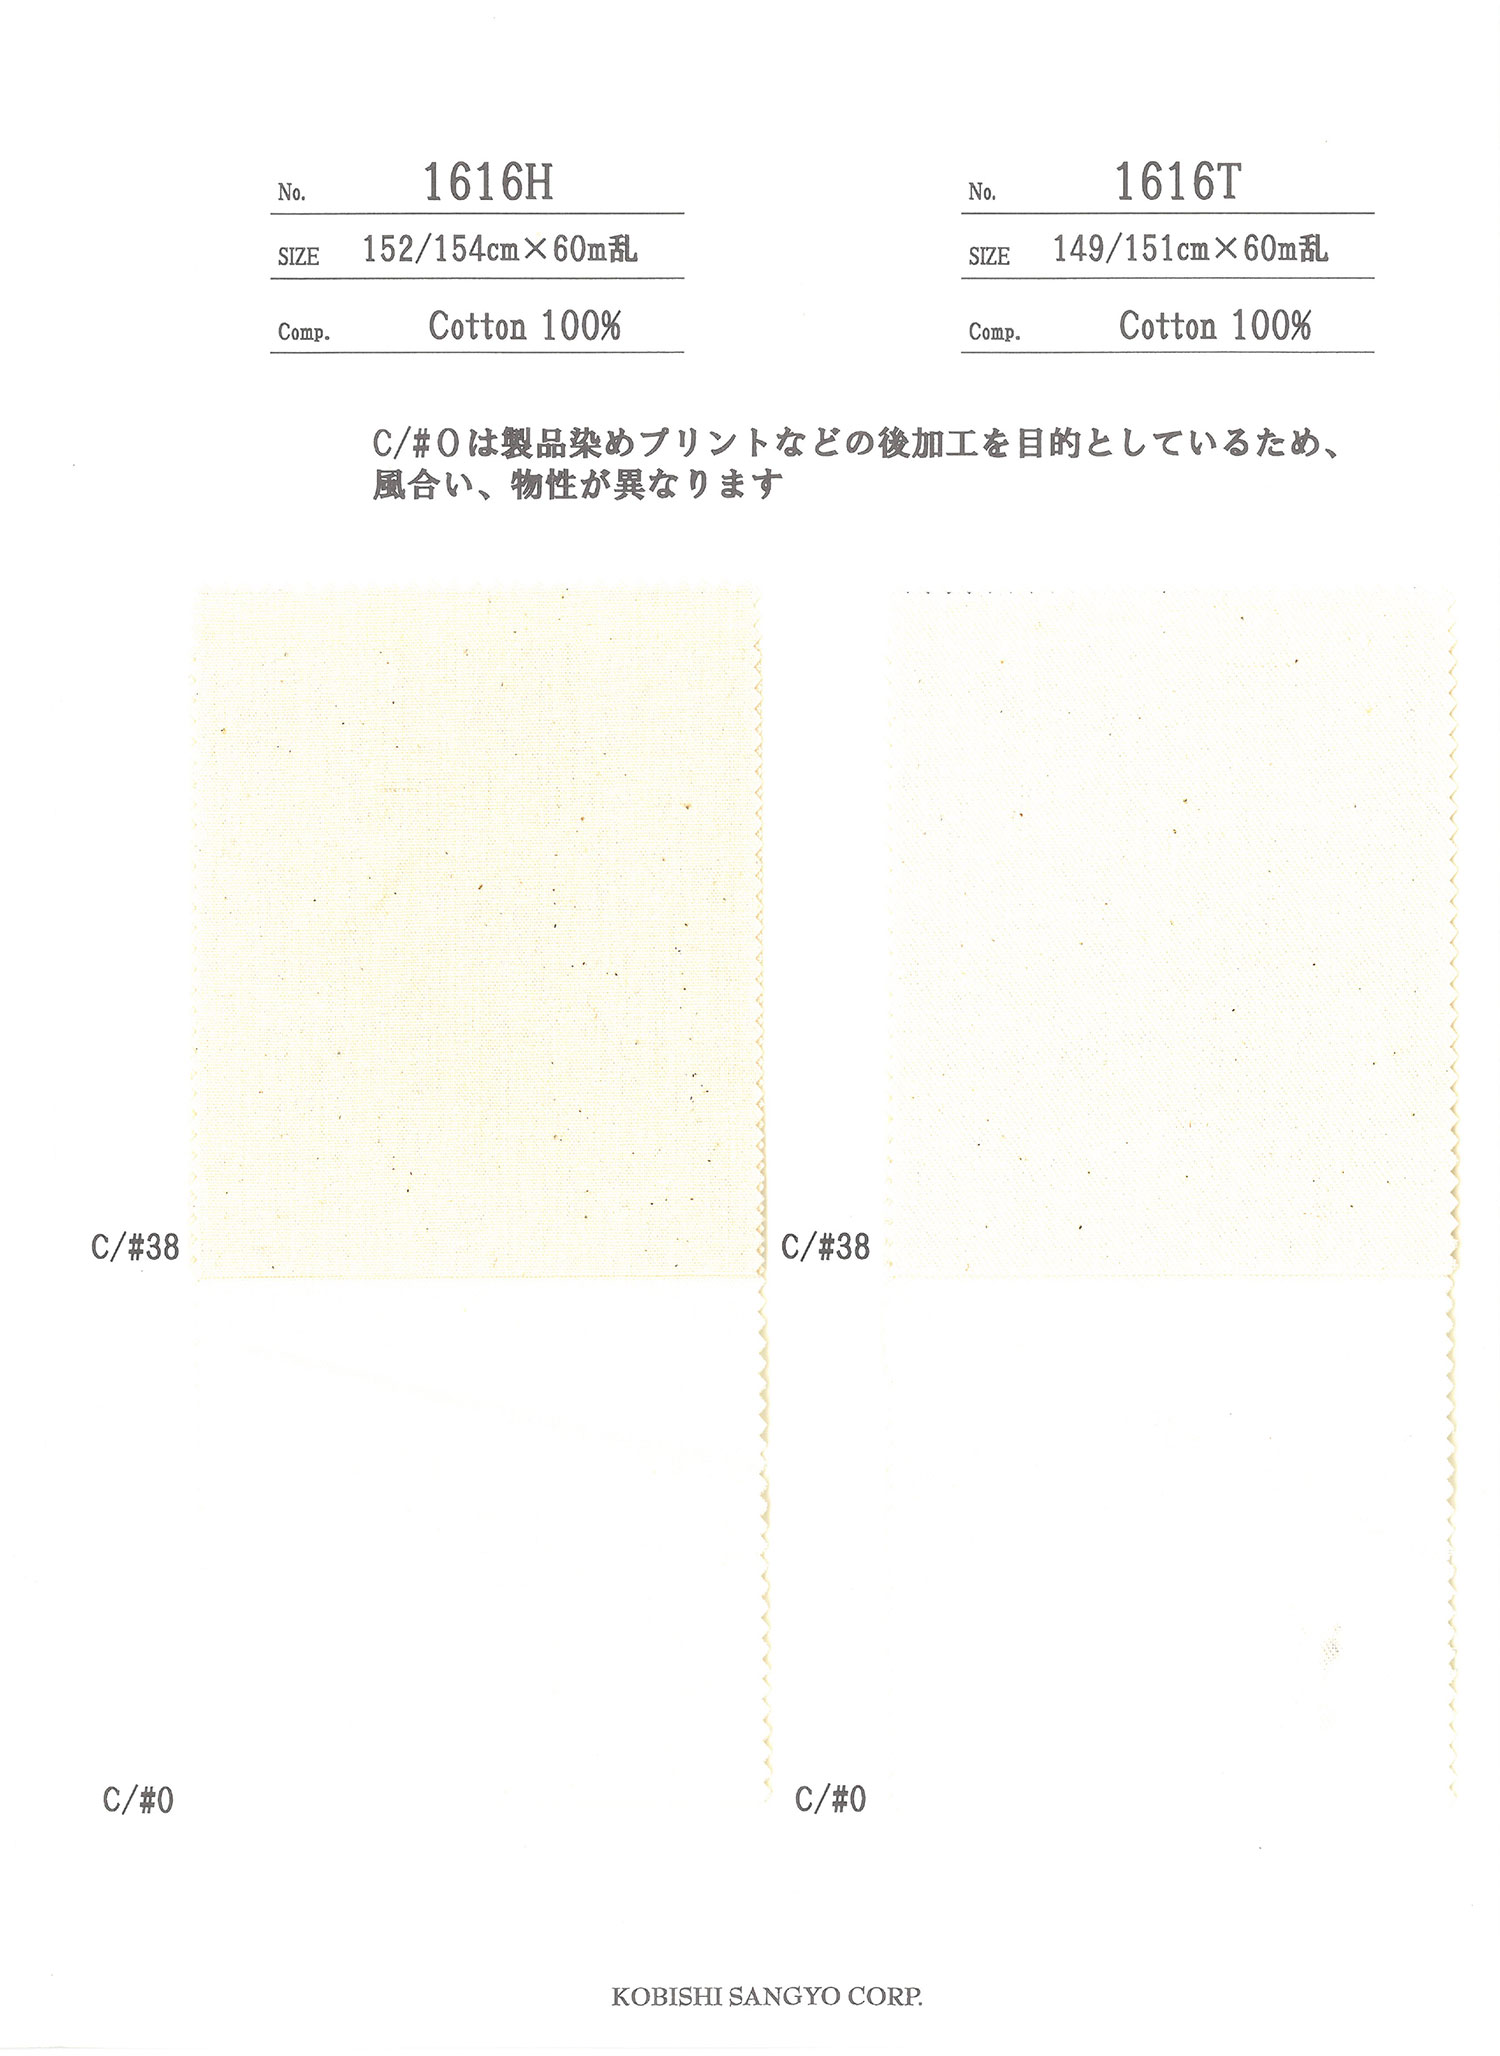 1616T 厚織り綾スレーキ[スレキ] 小菱産業/オークラ商事 - ApparelX アパレル資材卸通販